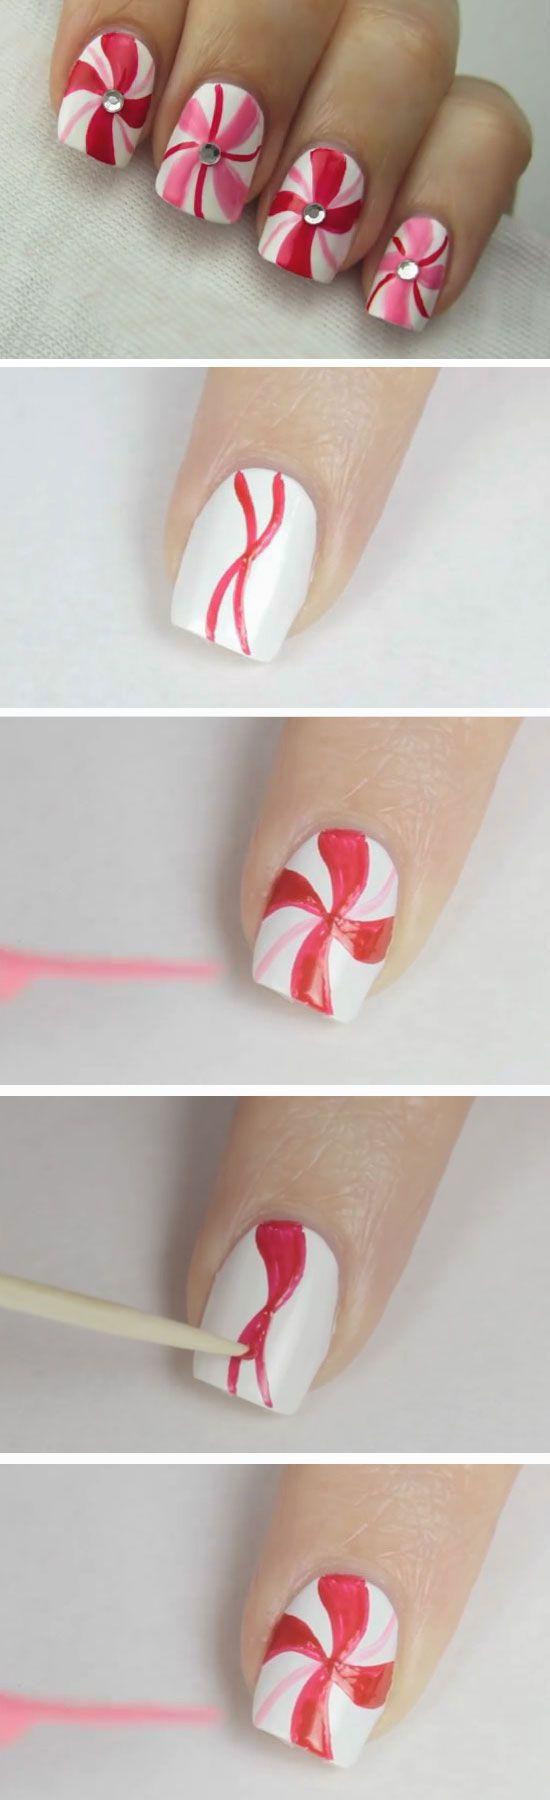 Peppermint Swirl Nail Art | DIY Christmas Nail Art Ideas ...